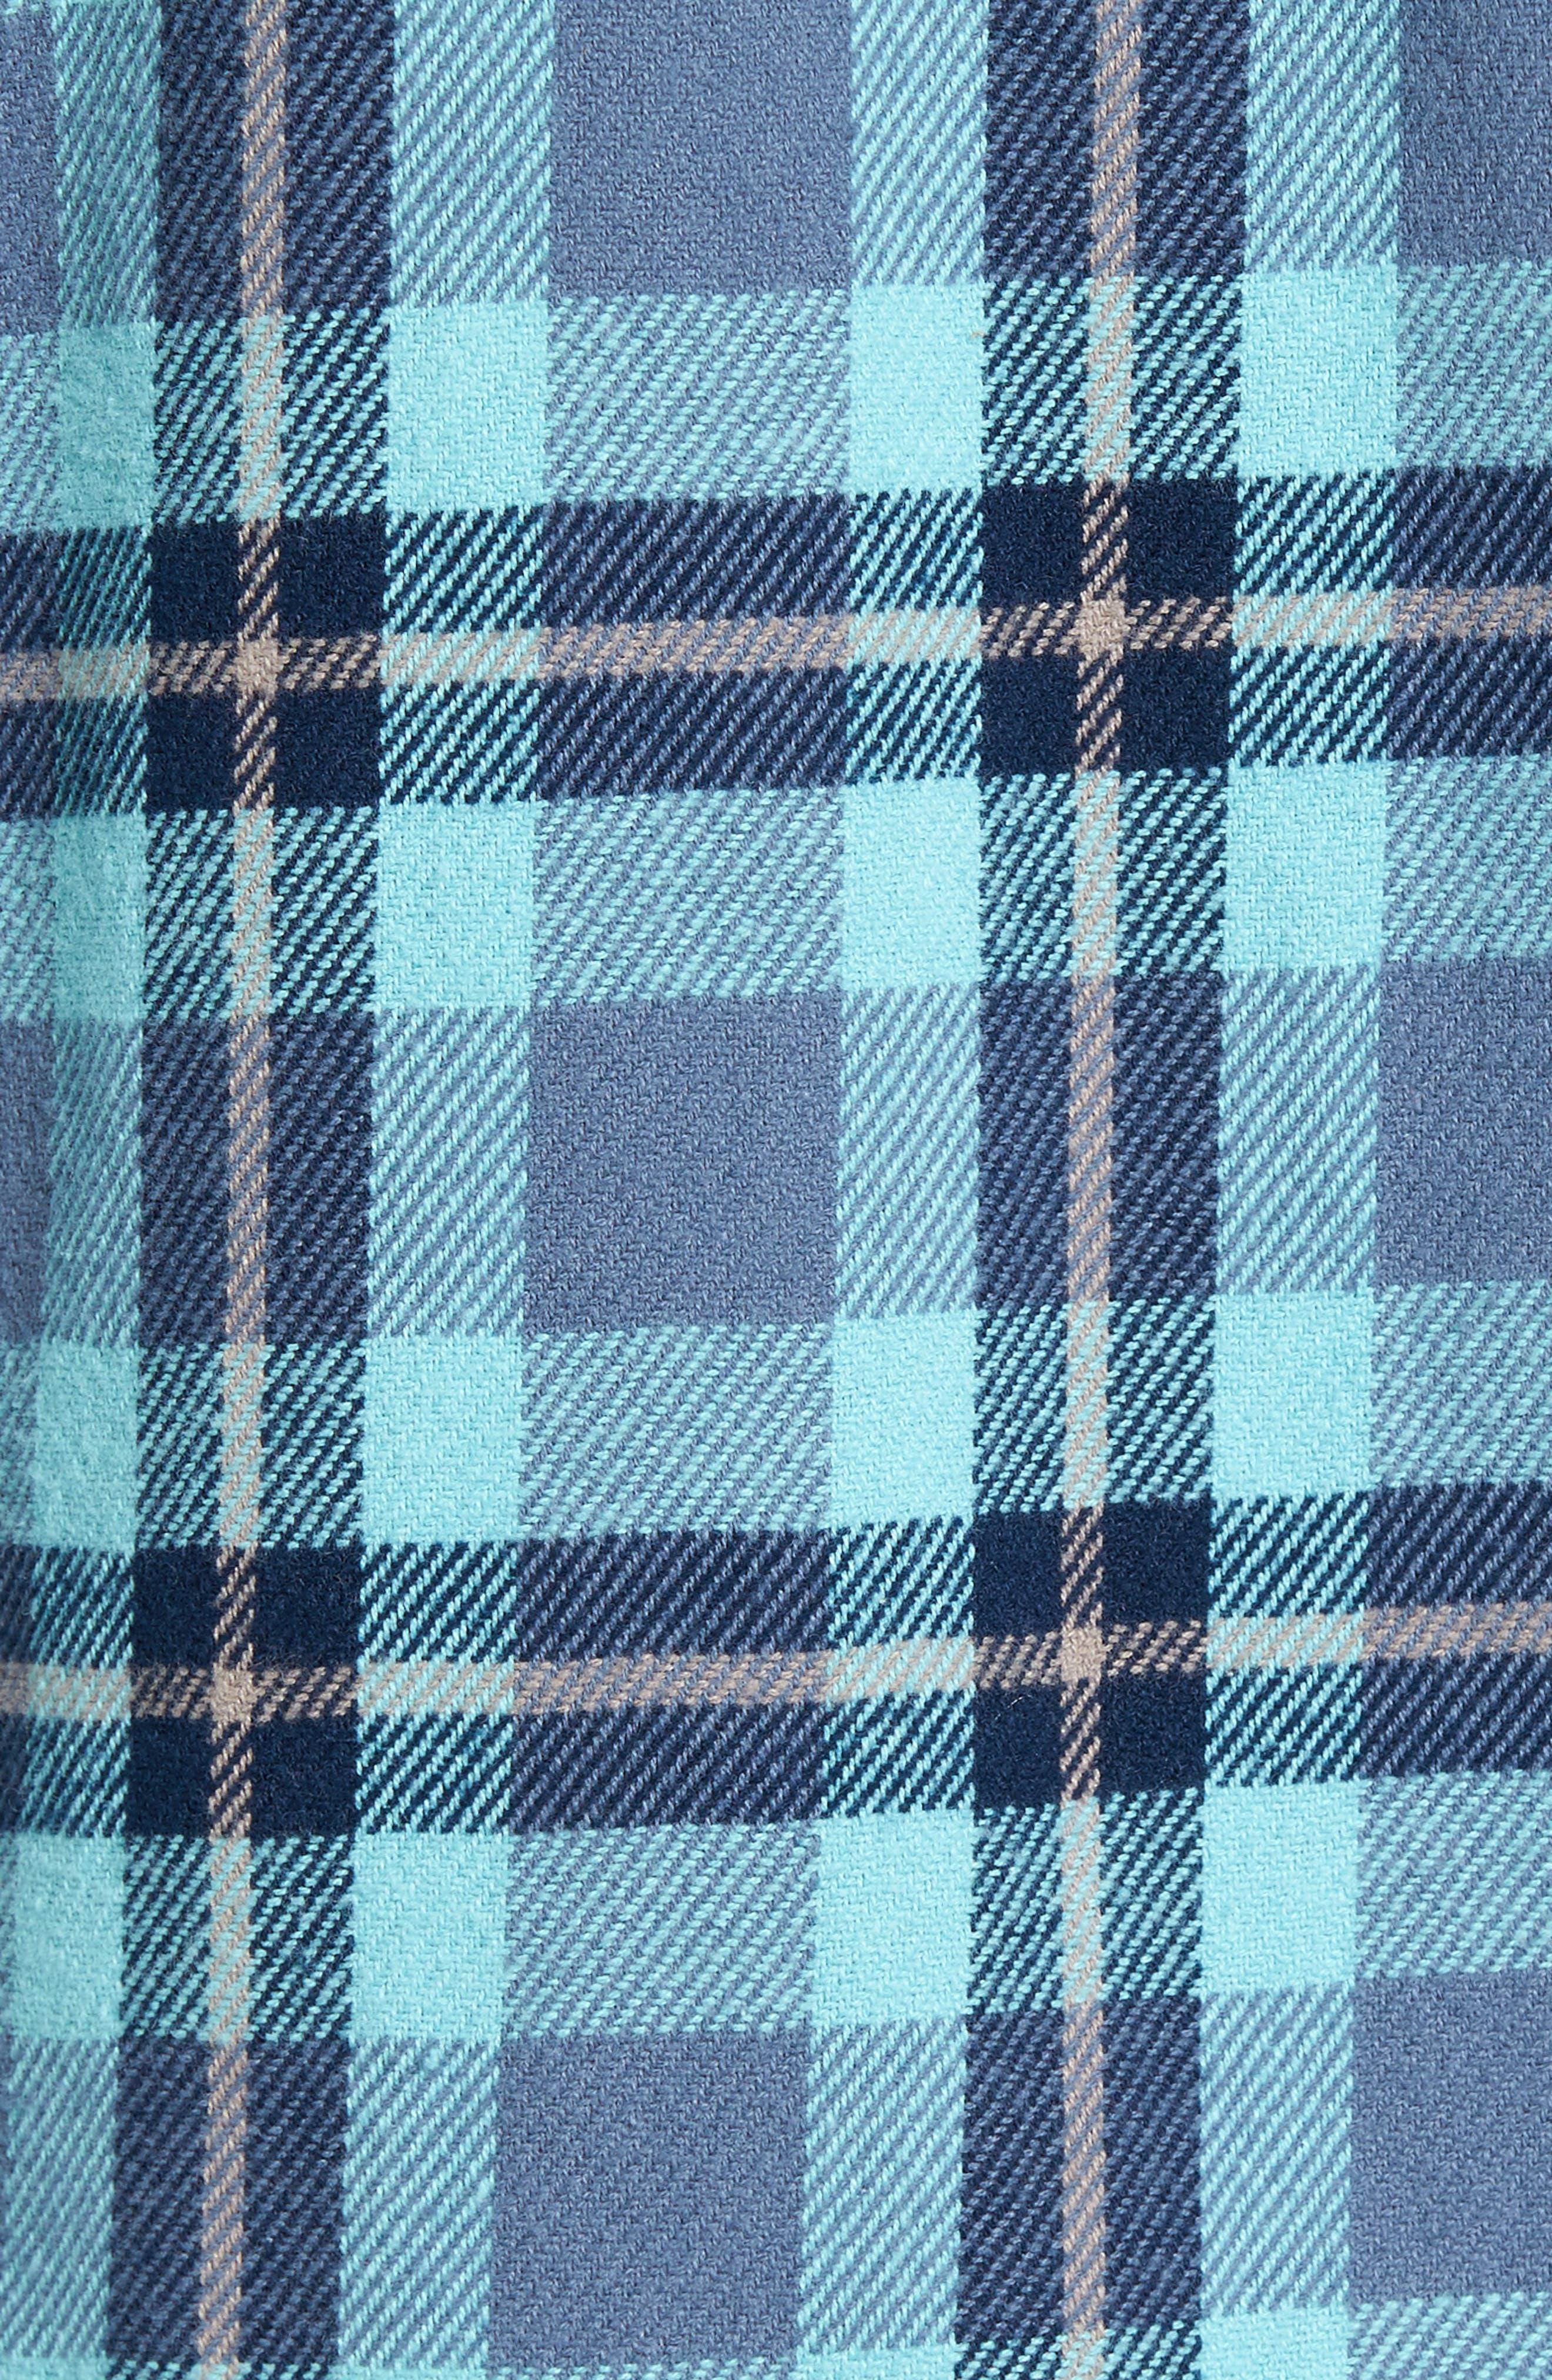 'That'll Work' Trim Fit Plaid Flannel Shirt,                             Alternate thumbnail 28, color,